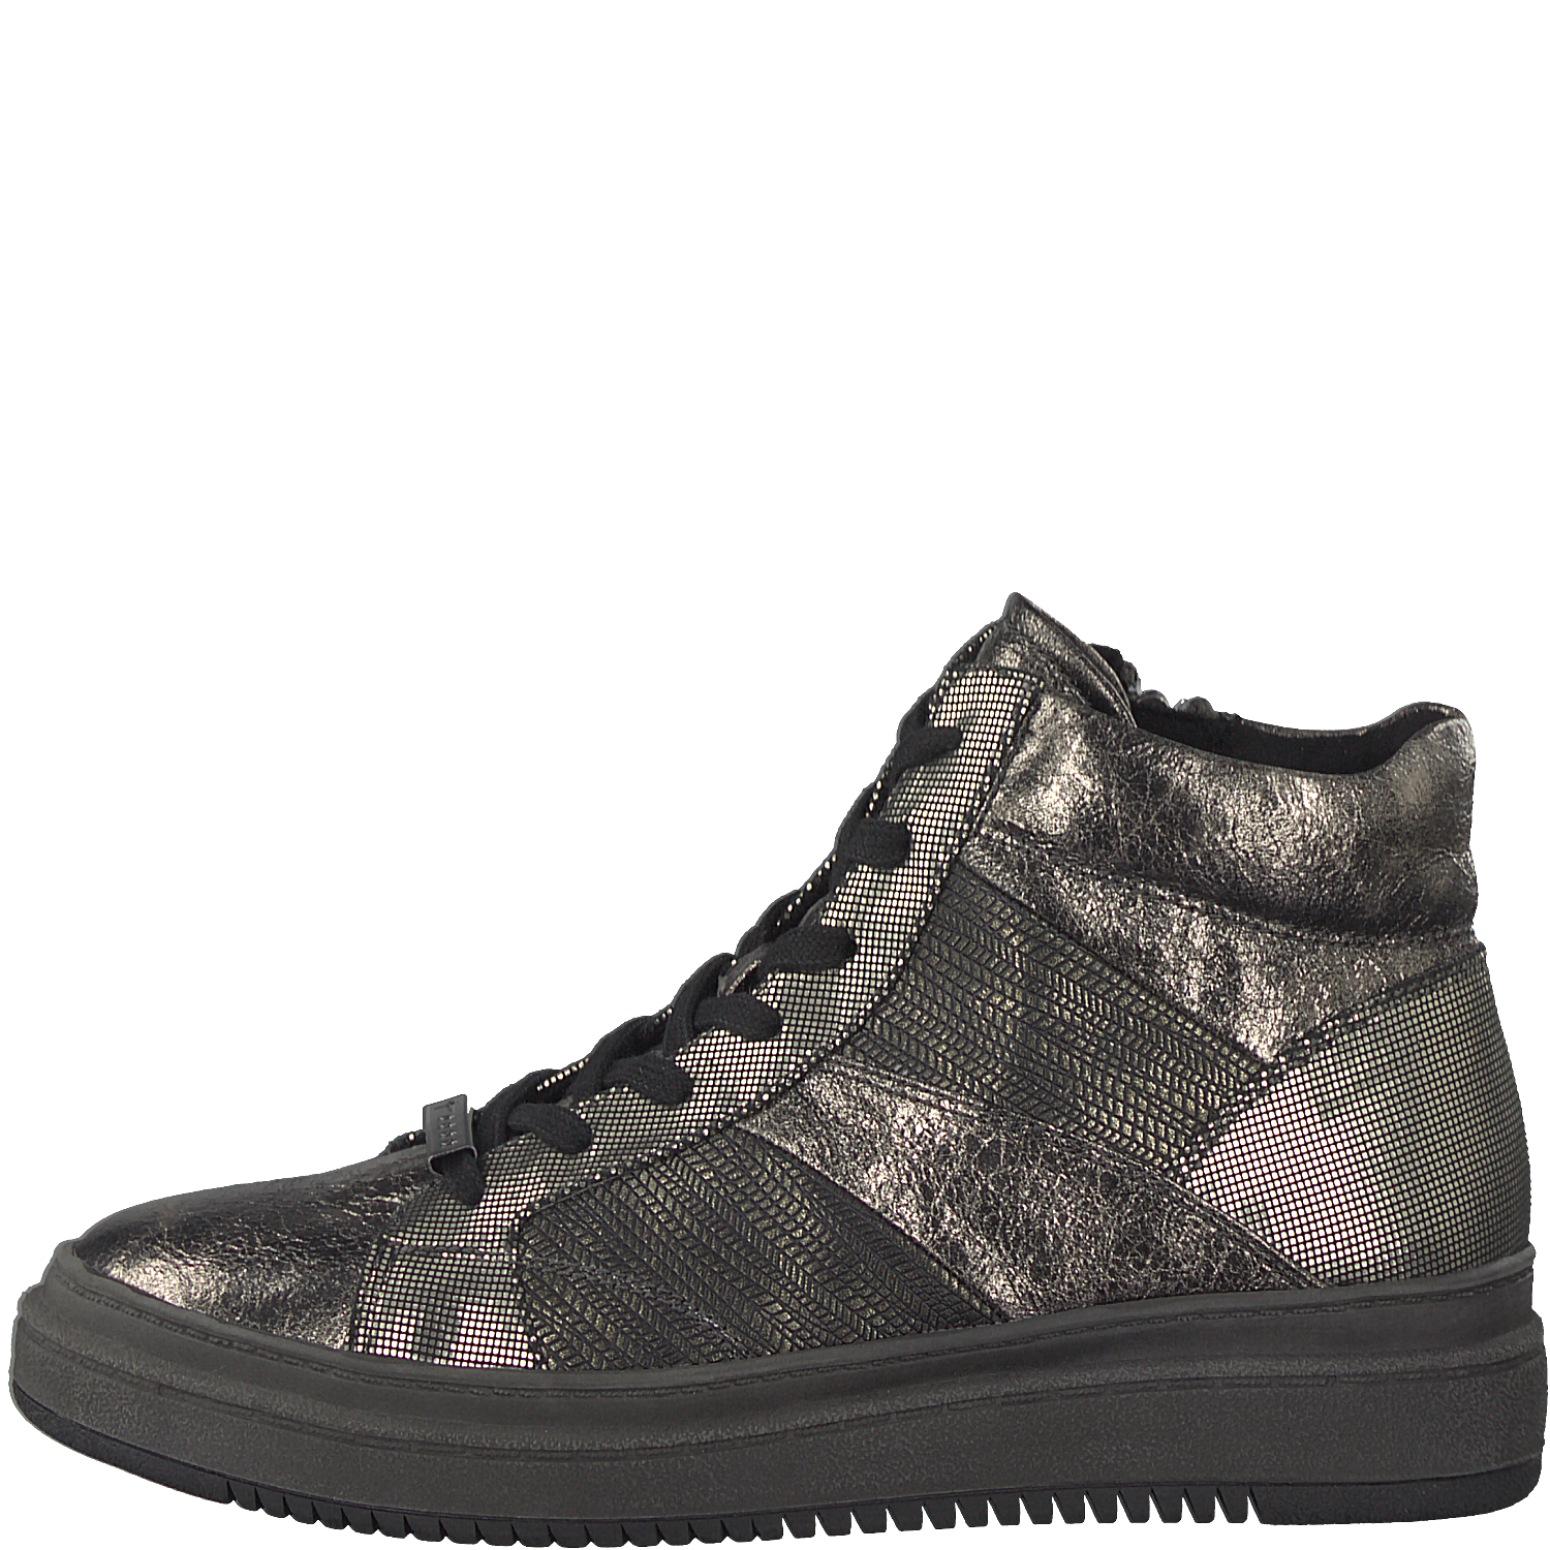 Tamaris Damen Sneaker 1-25224-29-934 platin / anthrait Damenschuhe ...